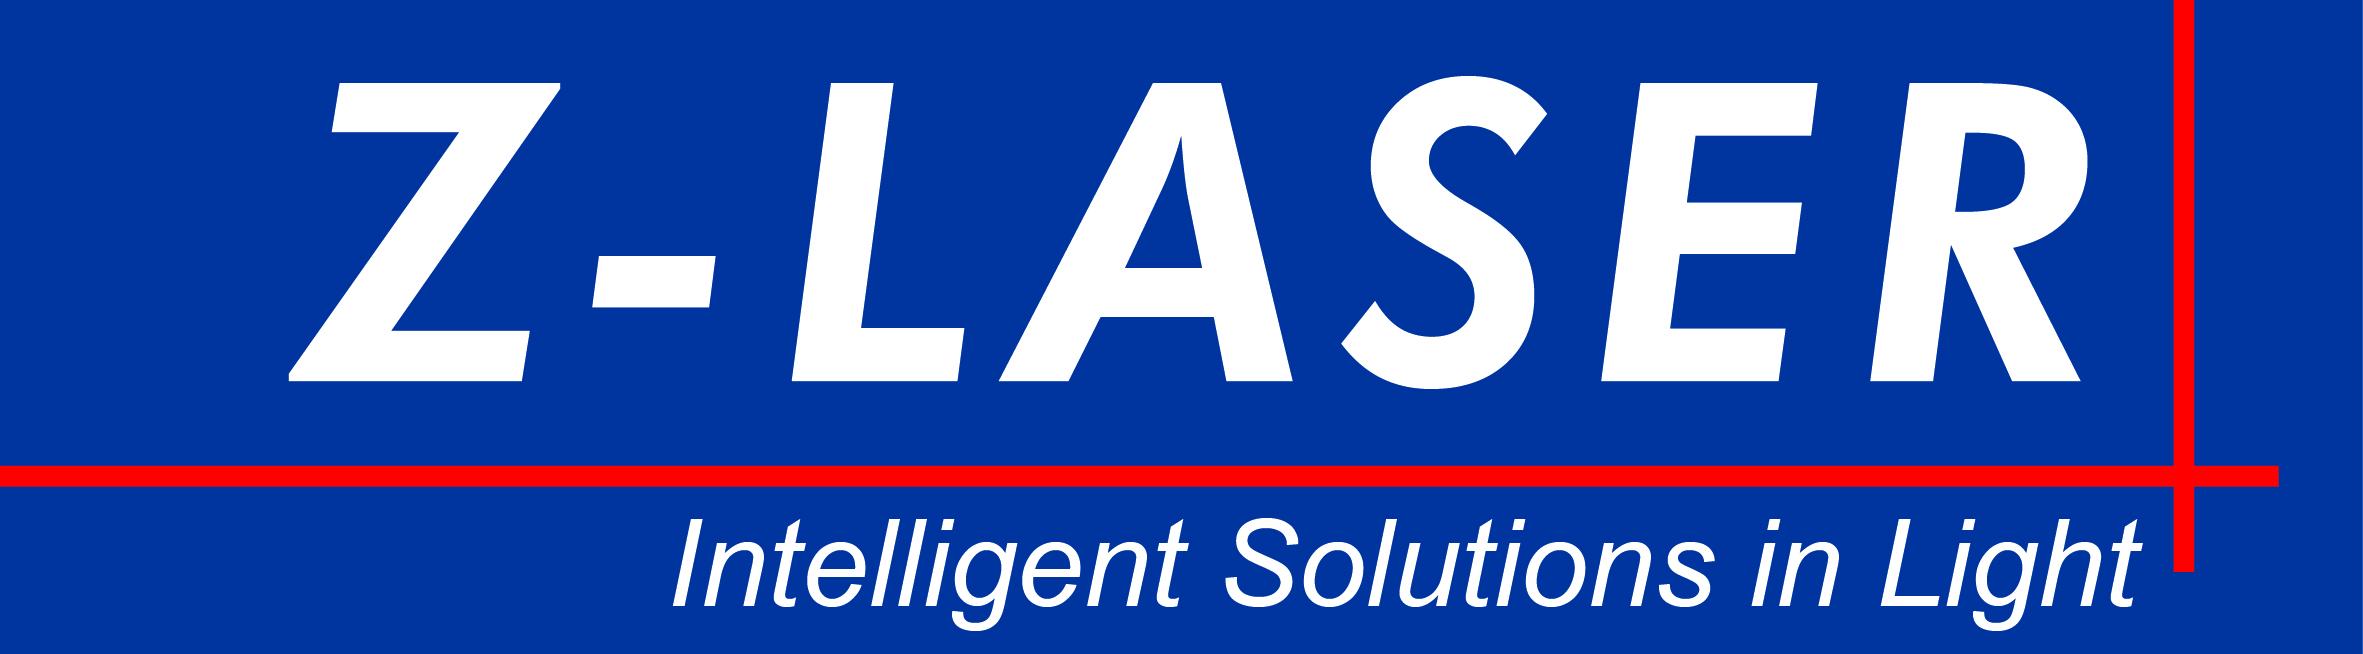 Z-LASER_Logo_2015_klassich_cmyk.jpg